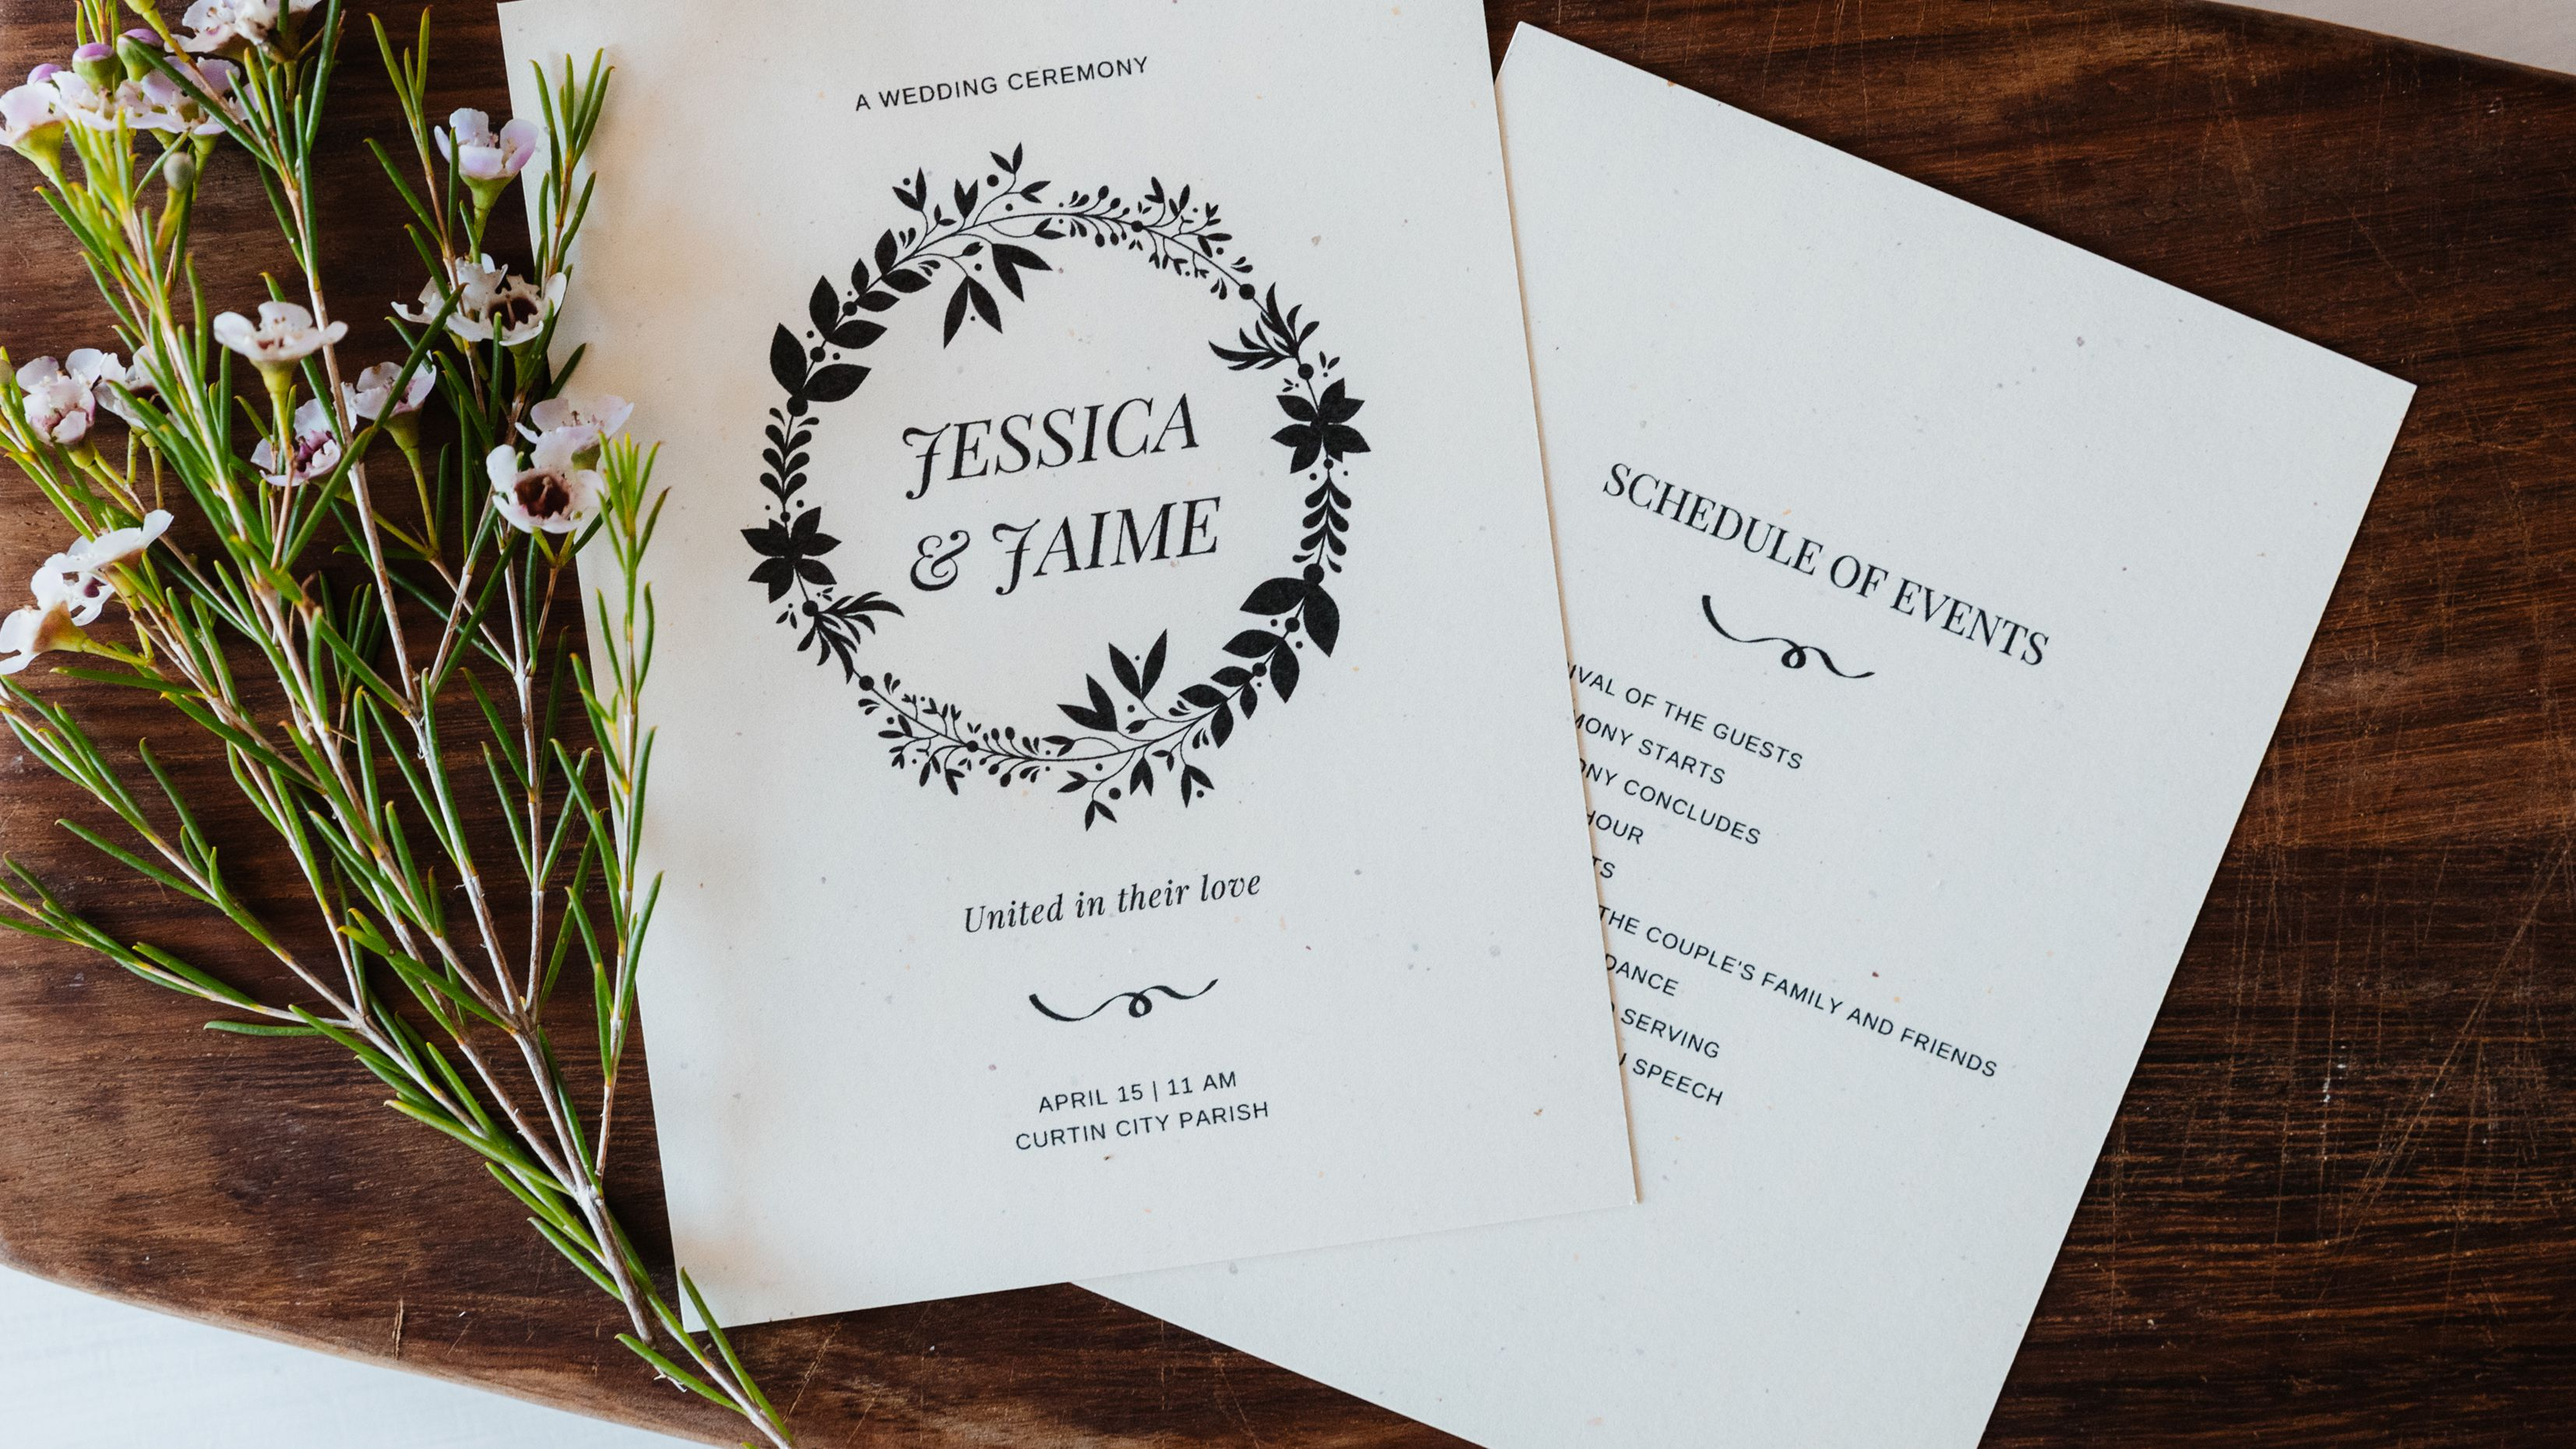 Free Wedding Program Templates You Can Customize With Regard To Free Event Program Templates Word